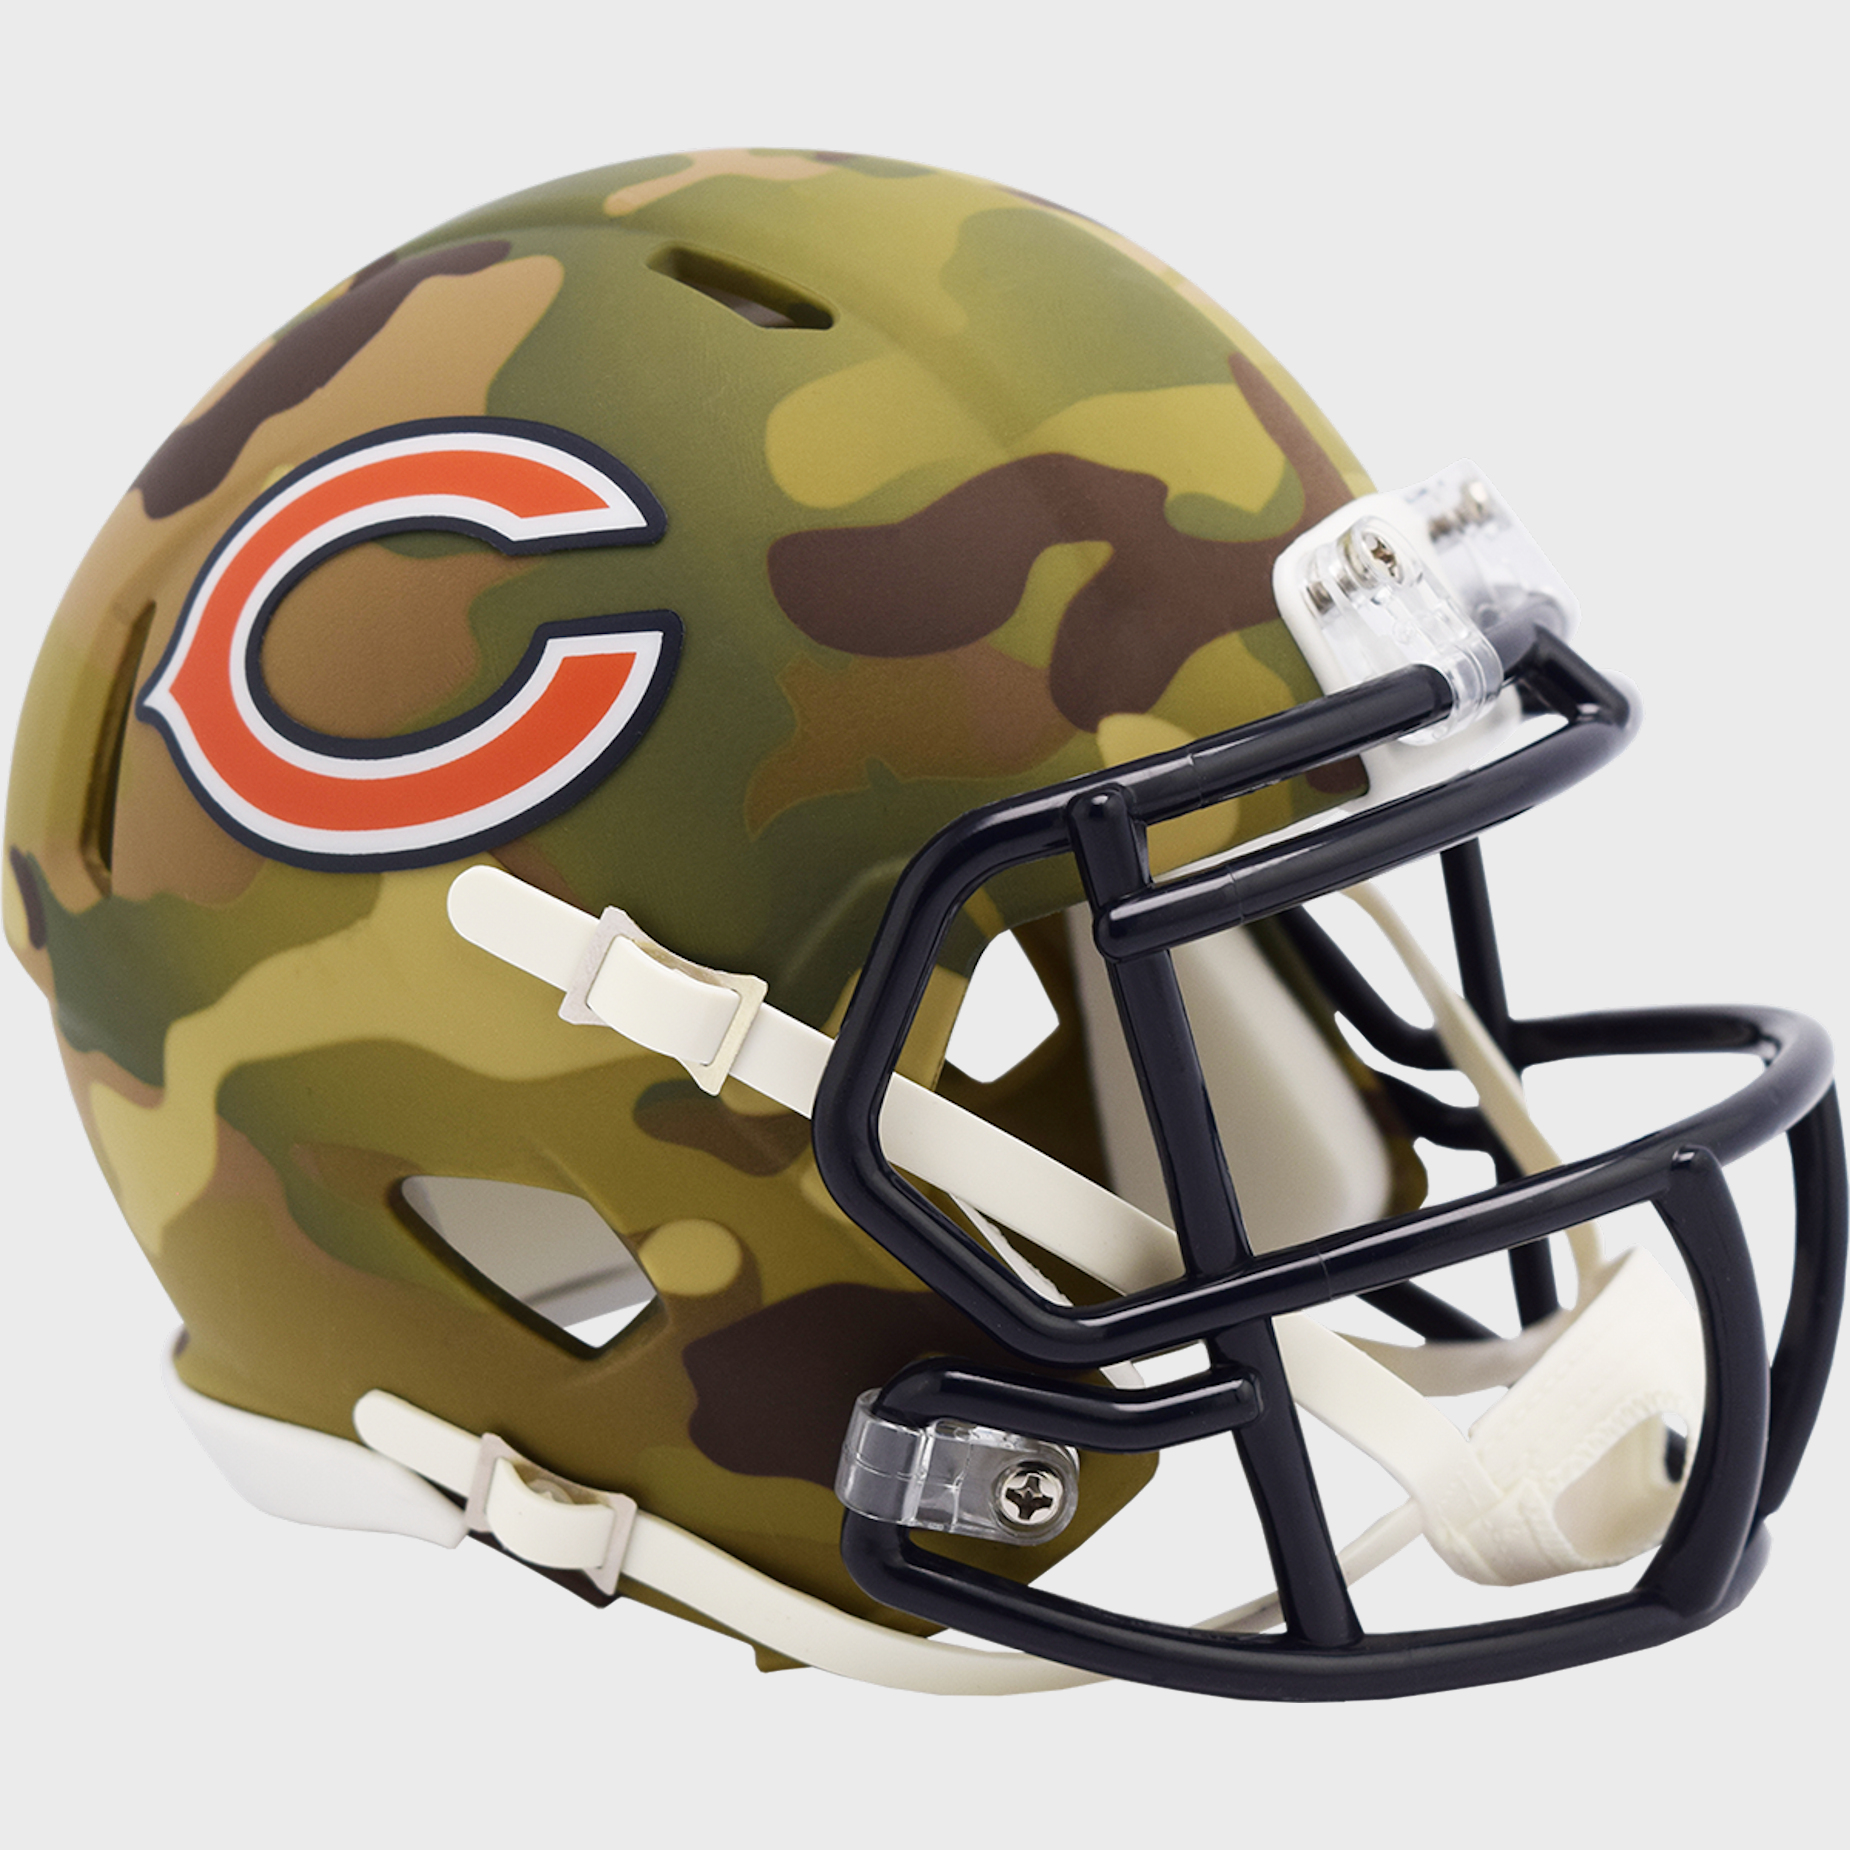 Chicago Bears NFL Mini Speed Football Helmet <B>CAMO</B>